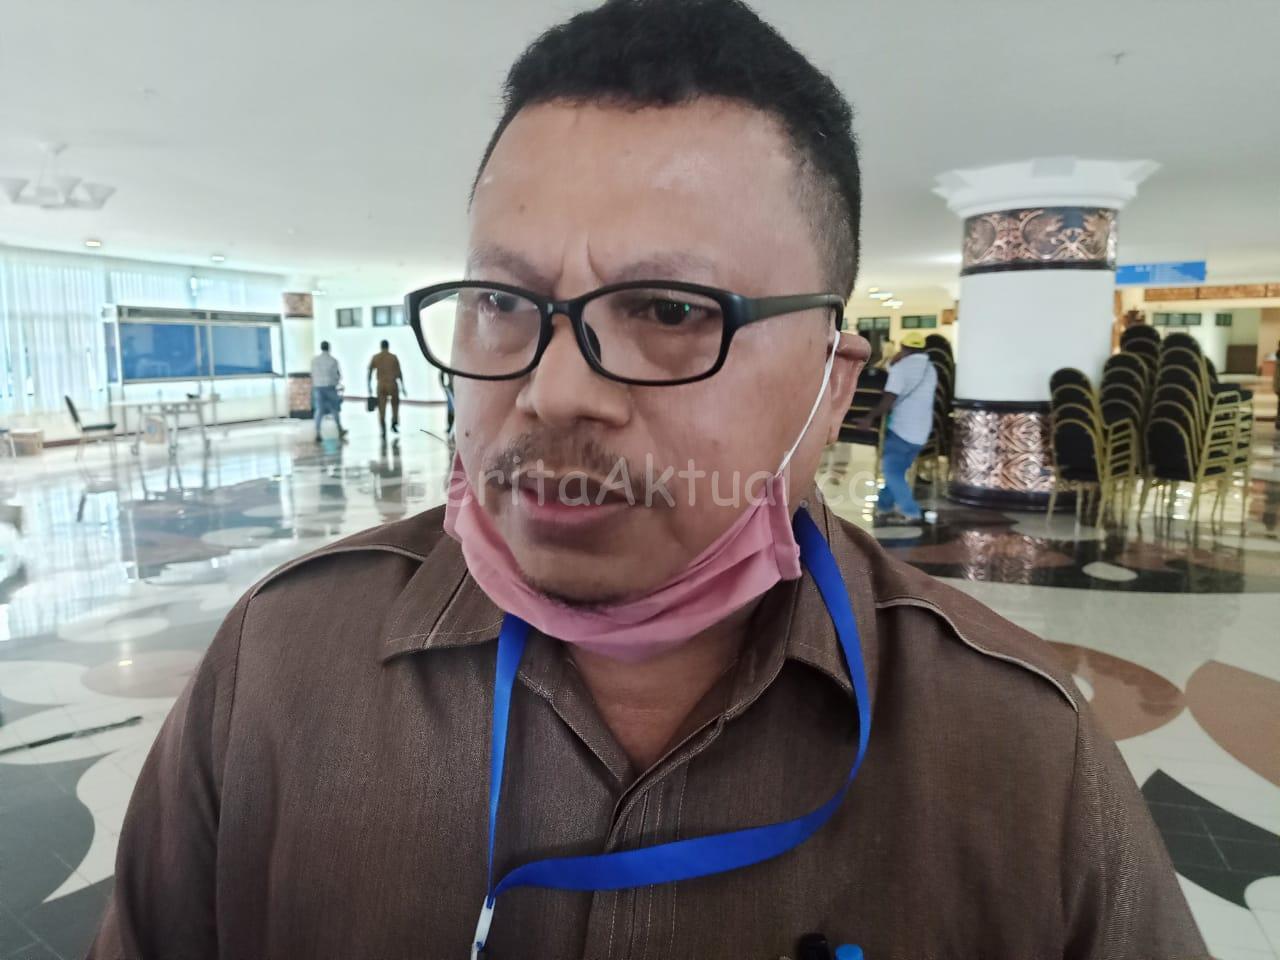 Hampir Sebulan Belum Ada Yang Klaim Sebagai Pencipta Lagu Tanah Papua 16 IMG 20200610 WA0023